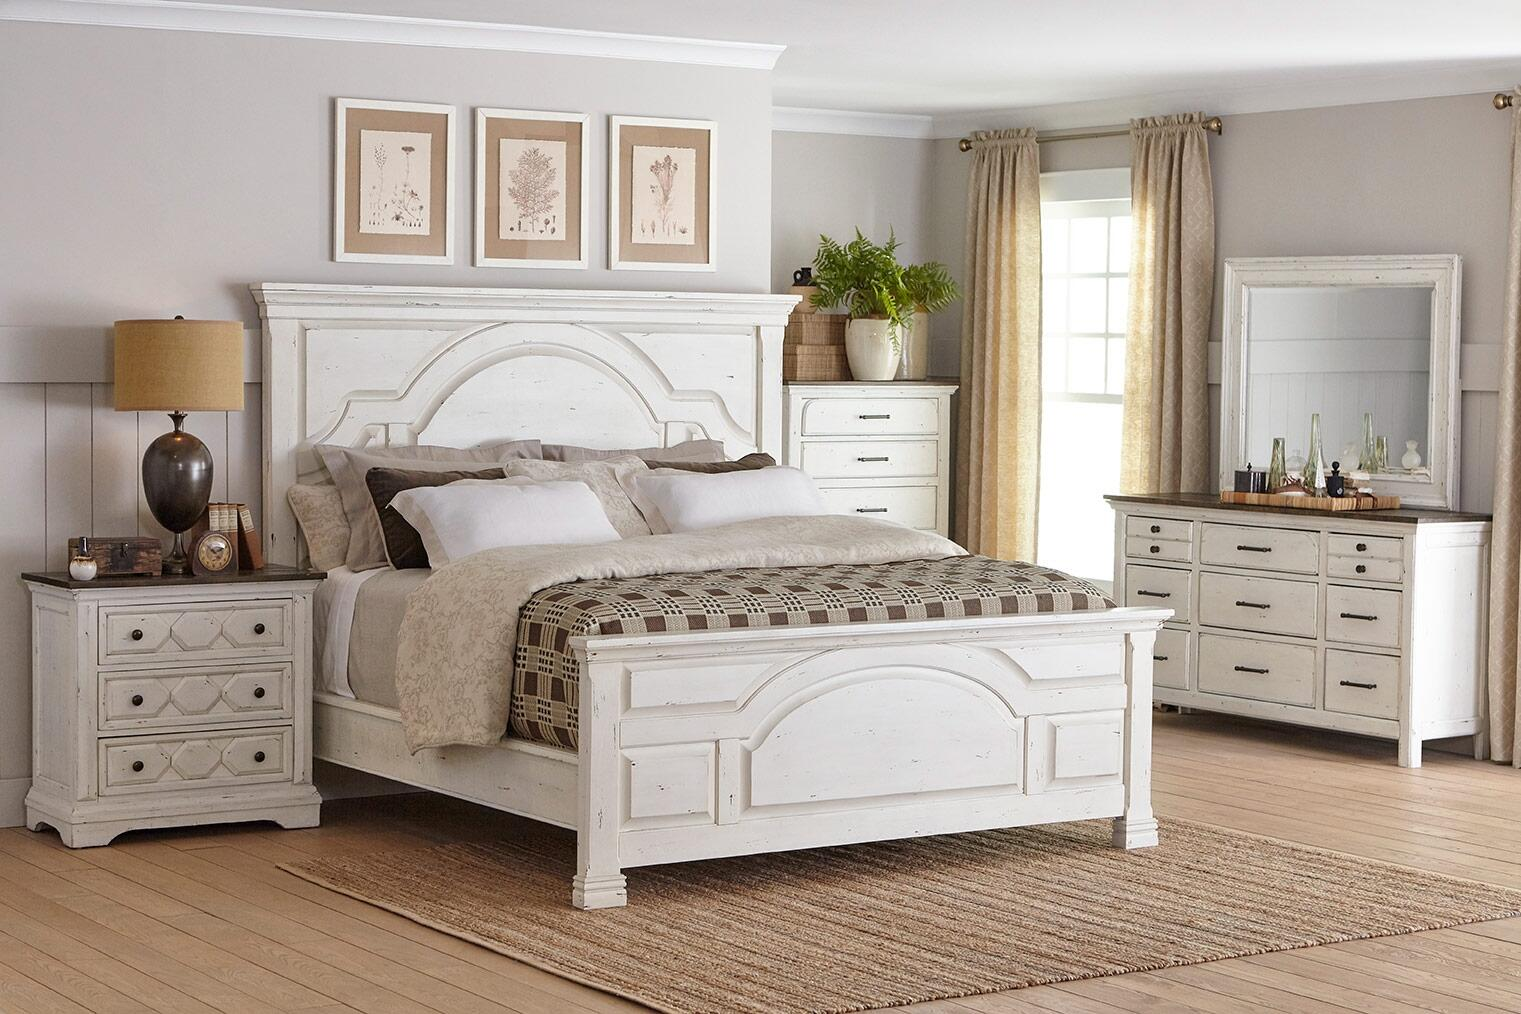 Coaster Celeste 5 Piece King Size Bedroom Set